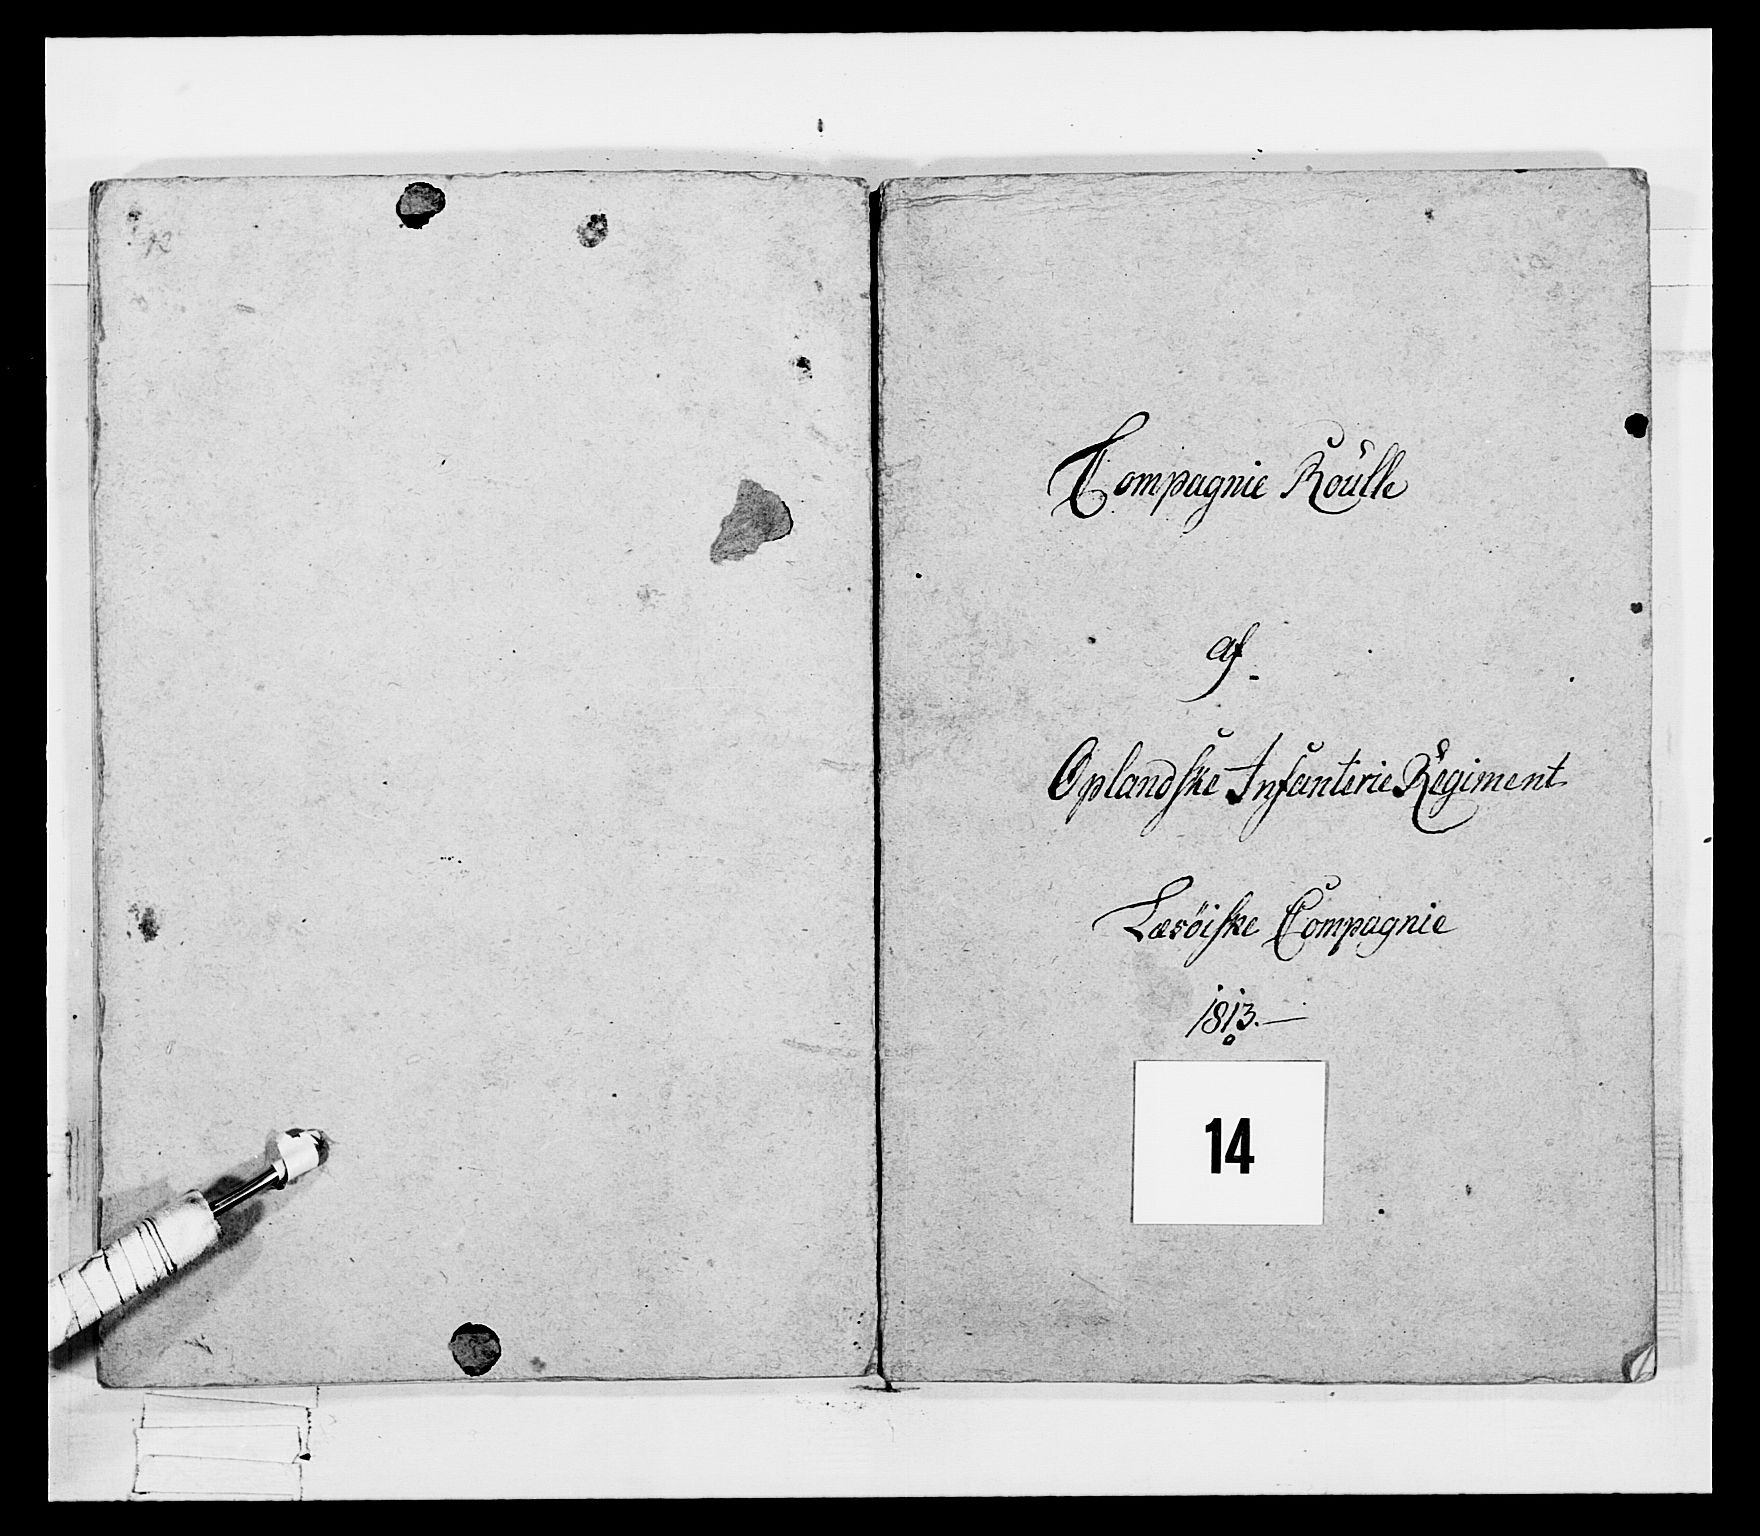 RA, Generalitets- og kommissariatskollegiet, Det kongelige norske kommissariatskollegium, E/Eh/L0069: Opplandske gevorbne infanteriregiment, 1810-1818, s. 662